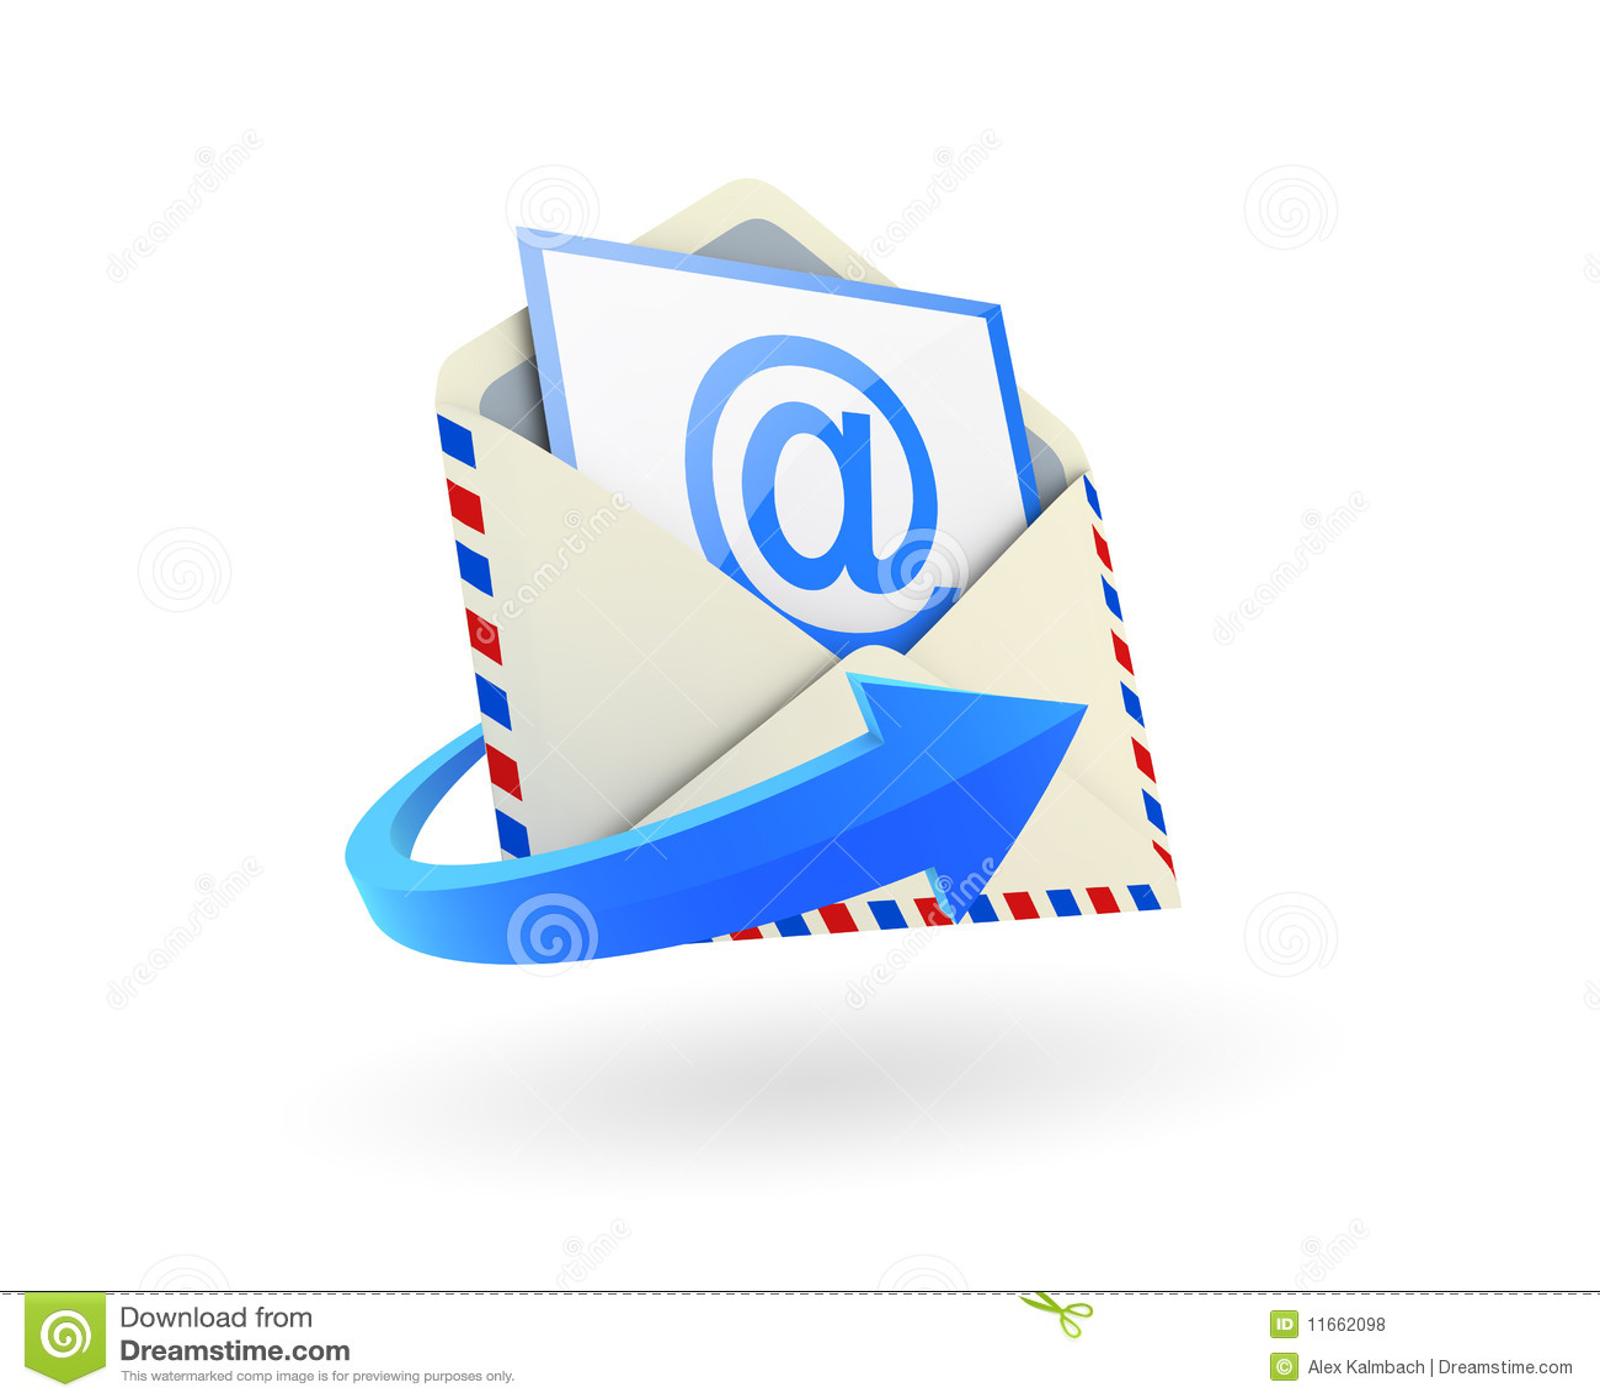 email icon stock illustration image of sign background 11662098. Black Bedroom Furniture Sets. Home Design Ideas